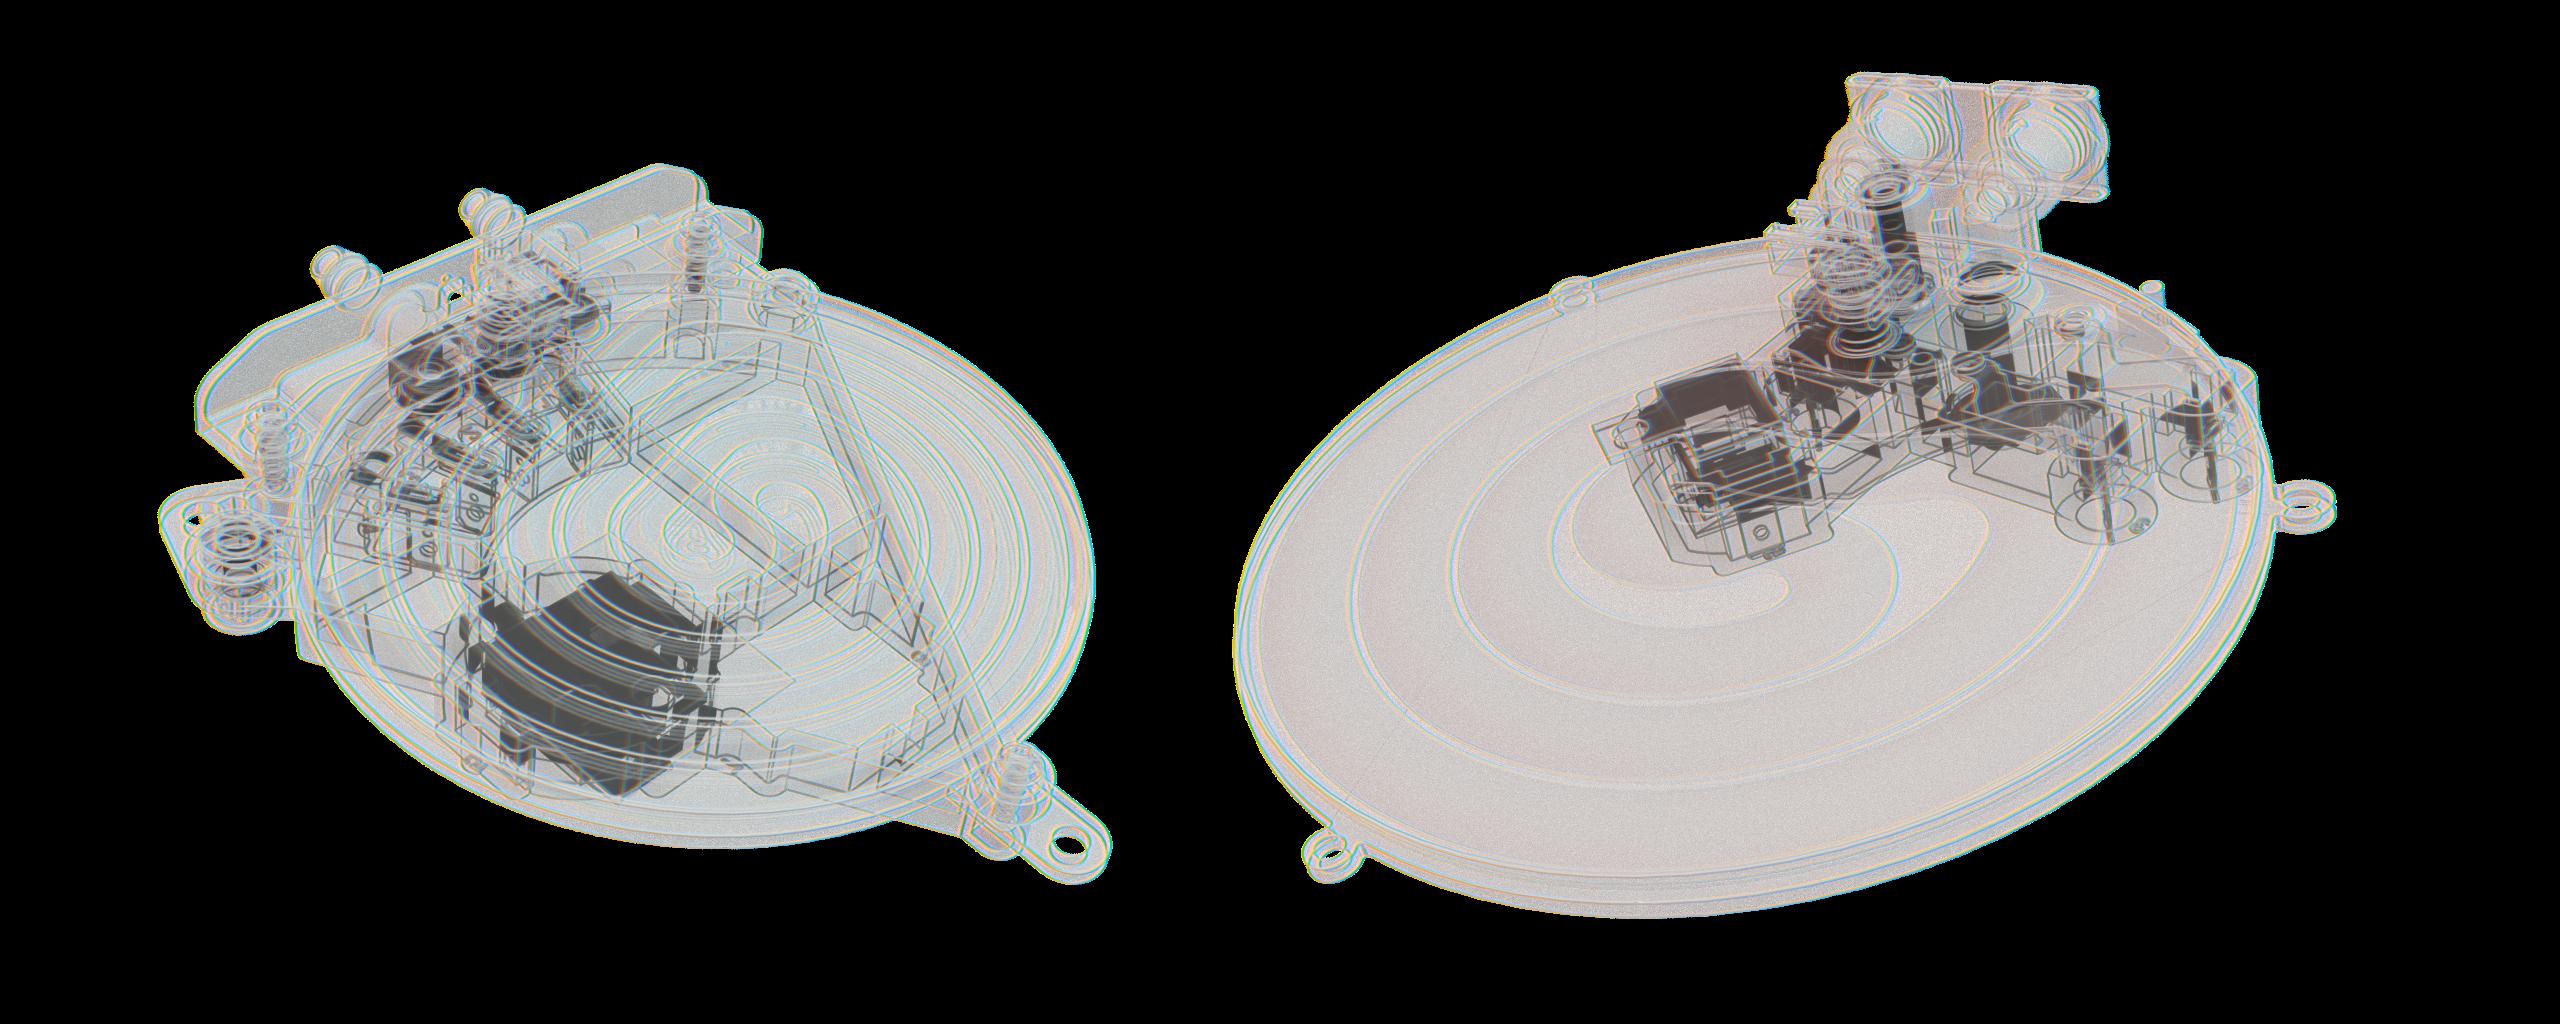 Blueprint view of Ferro Techniek products